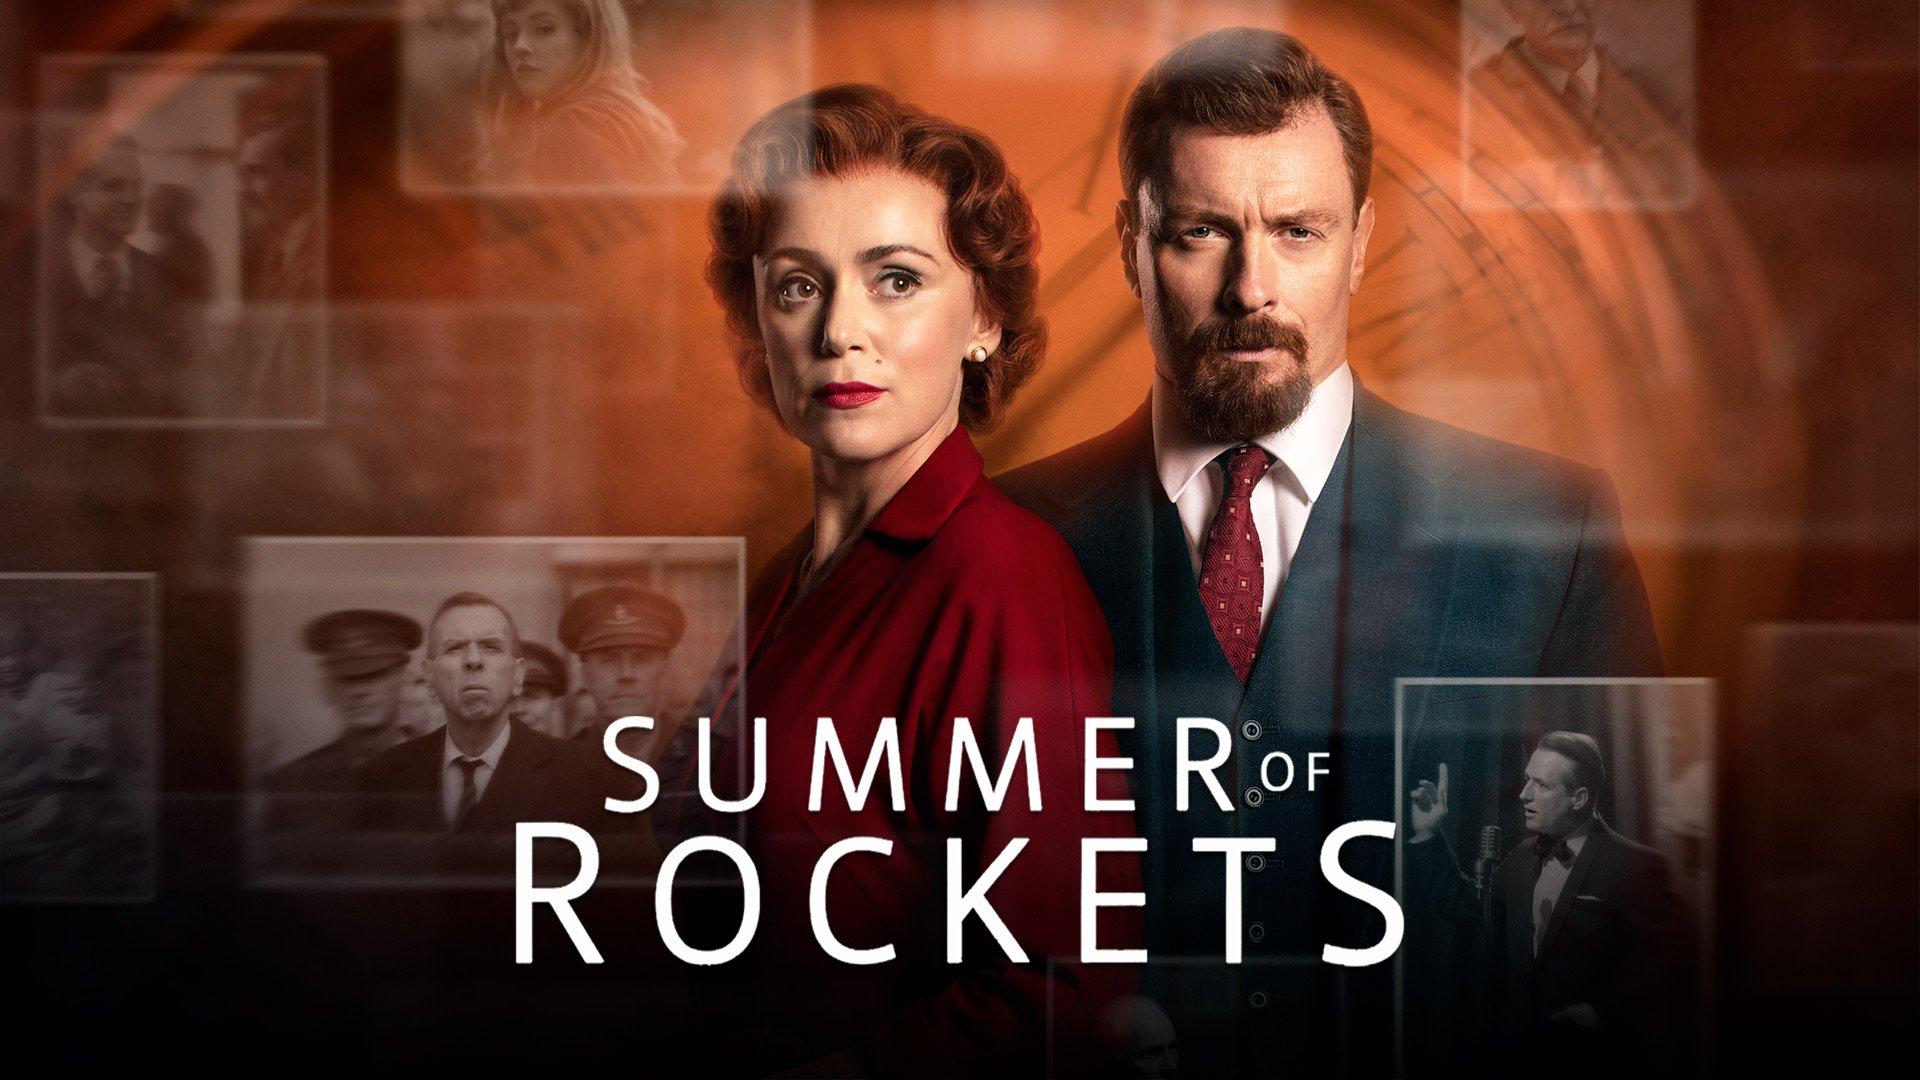 Summer of Rockets on BritBox UK